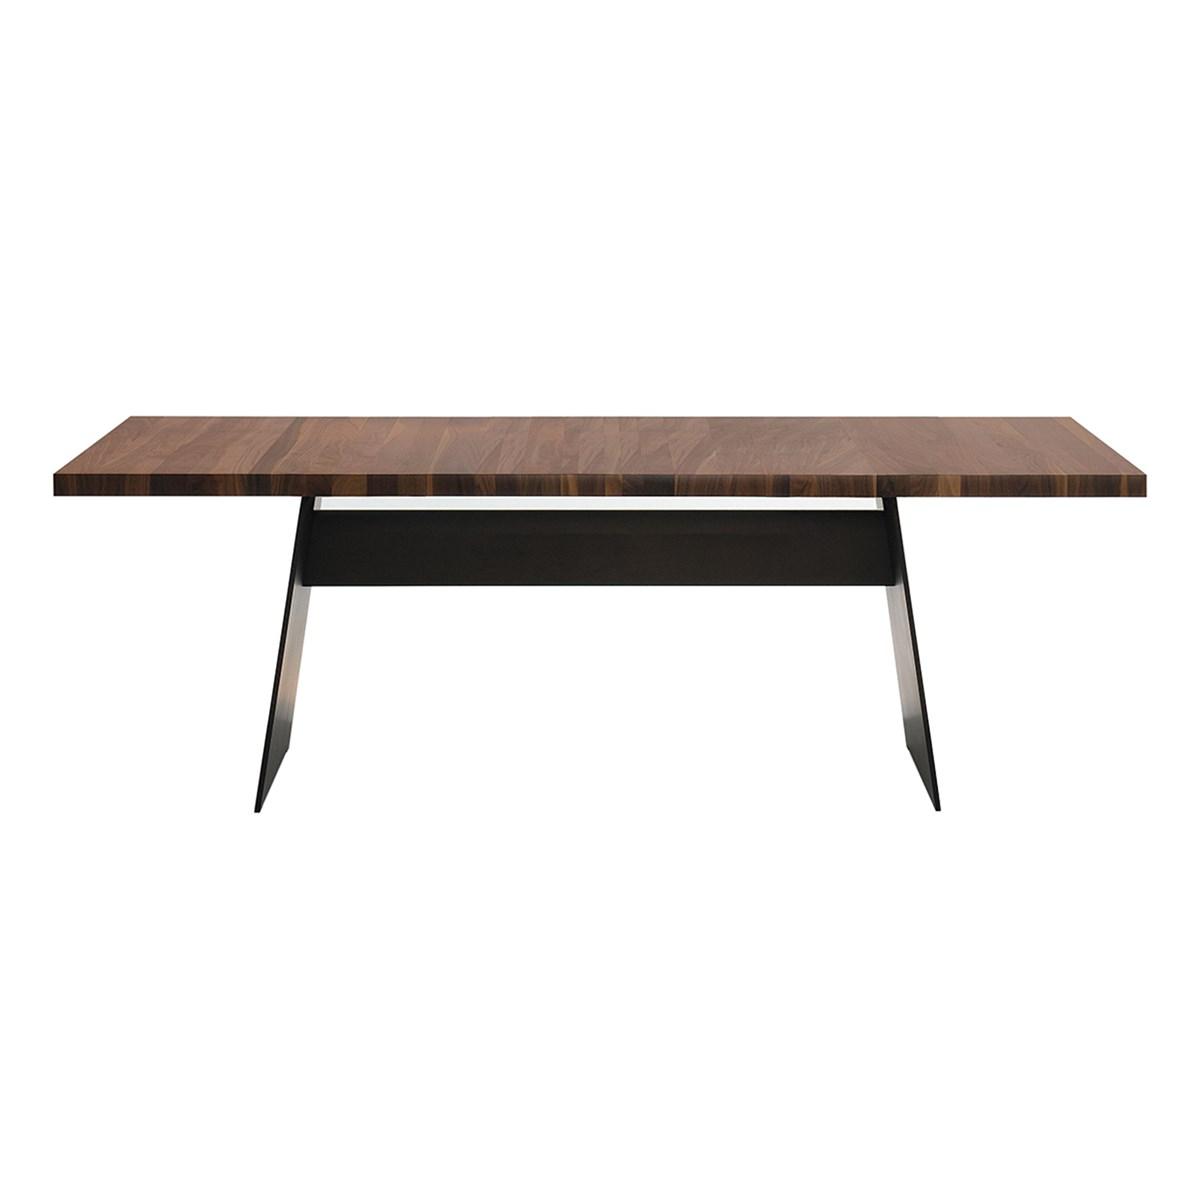 Walter-Knoll-EOOS-Tadeo-Table-Matisse-1